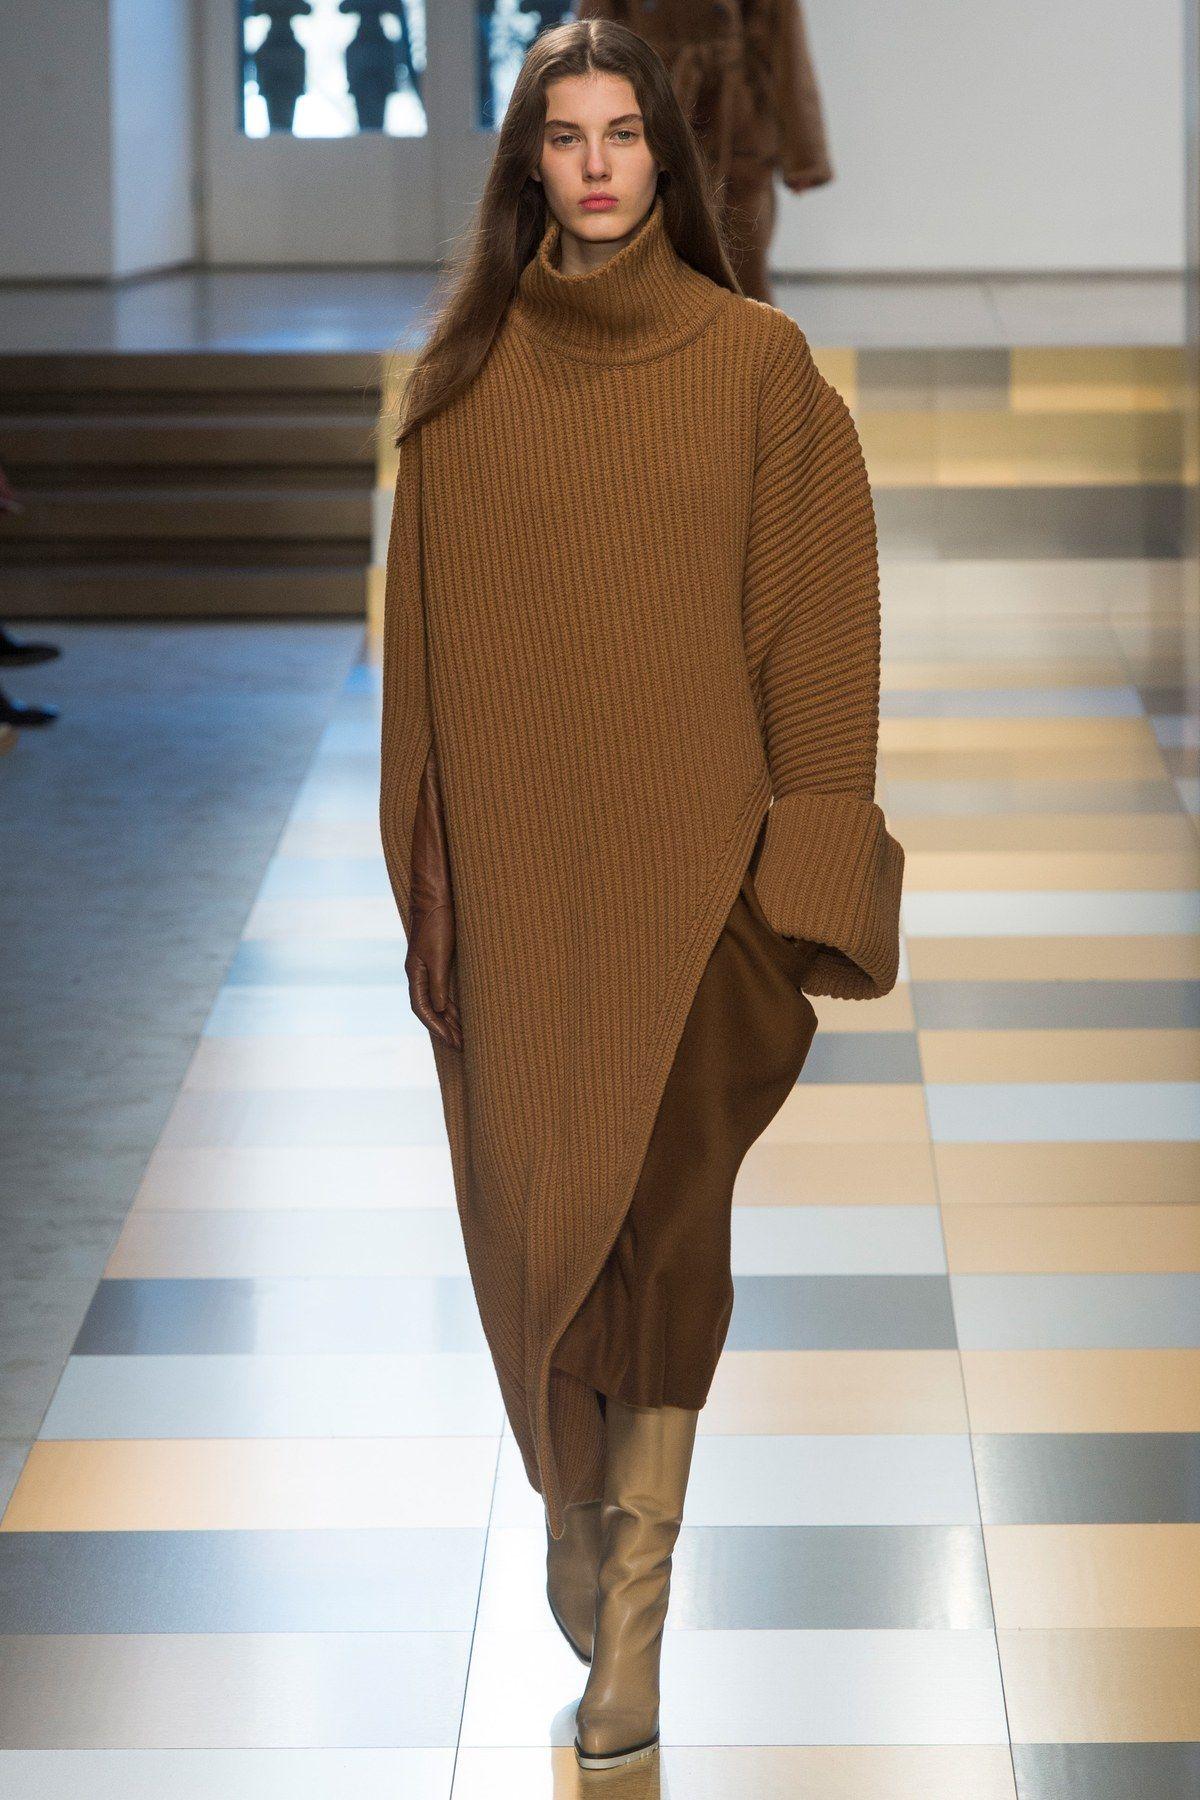 http://www.vogue.com/fashion-shows/fall-2017-ready-to-wear/jil-sander